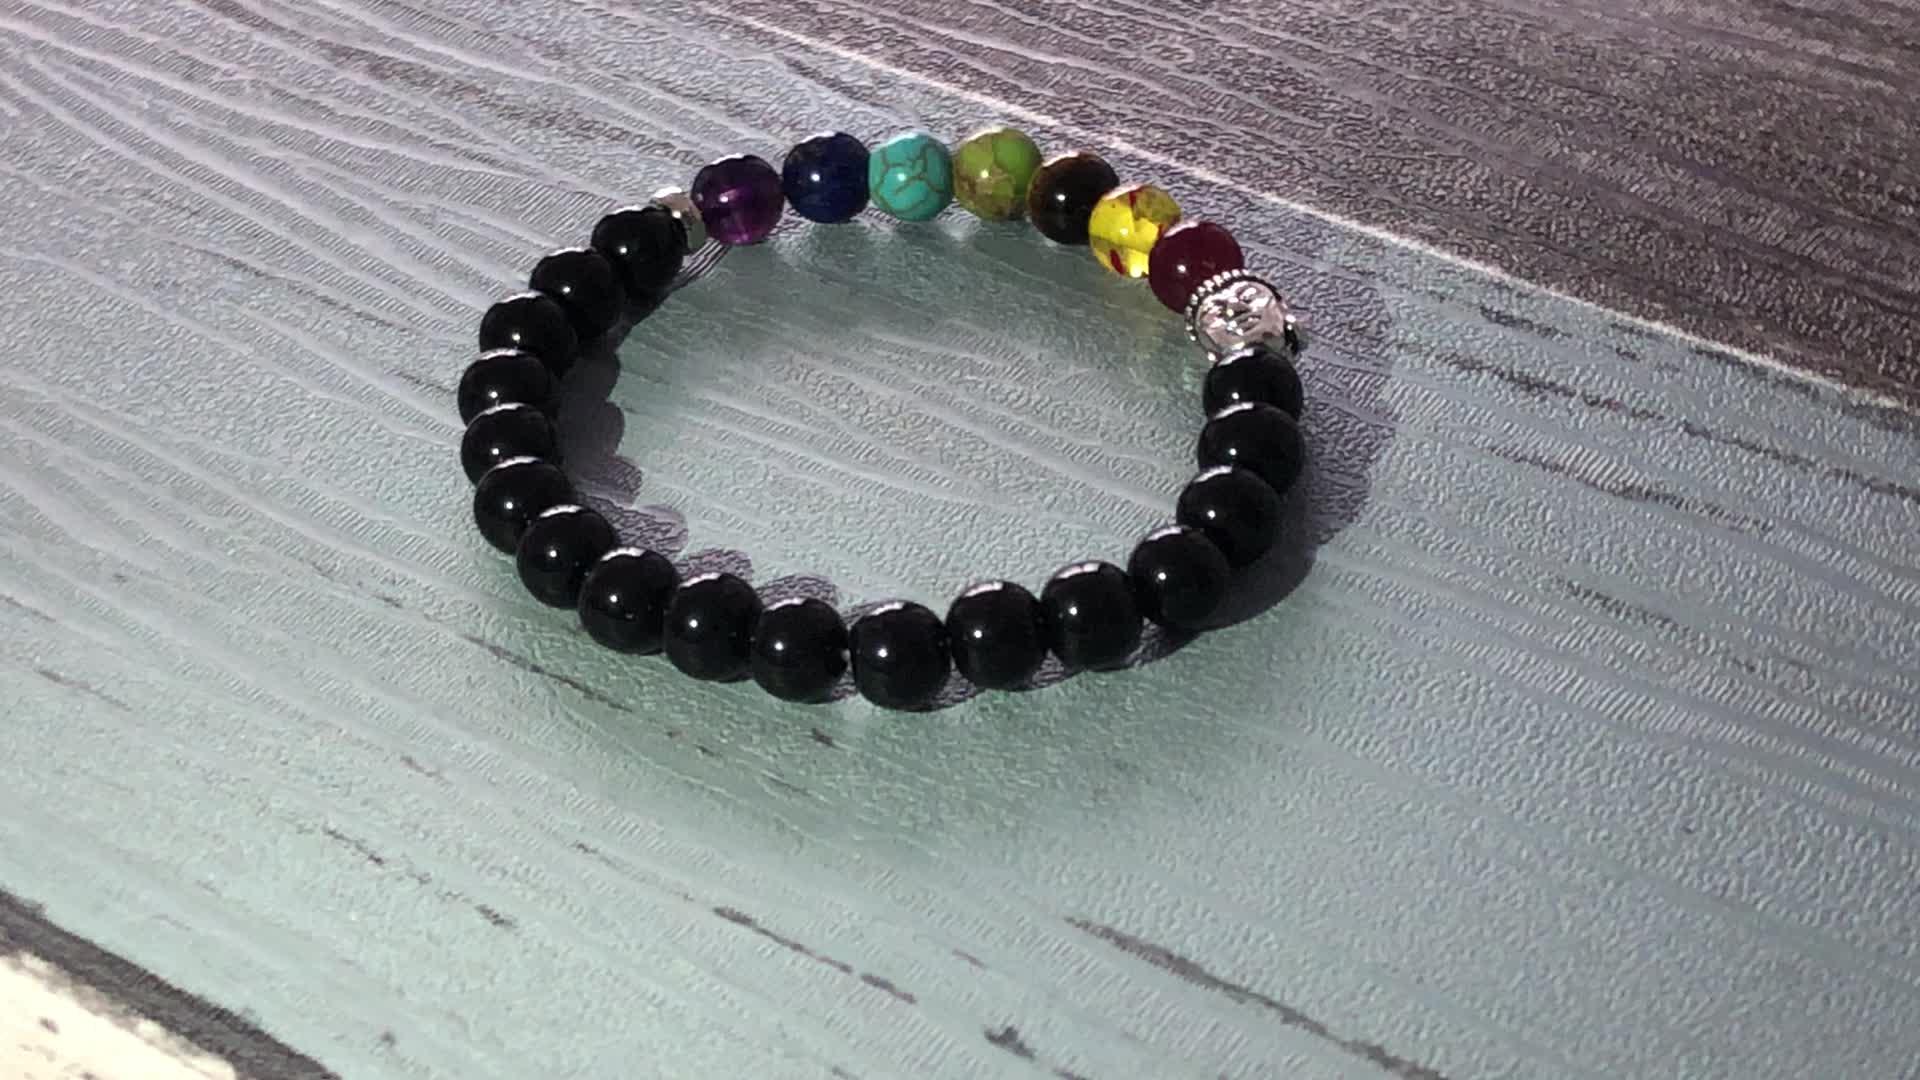 SN0921 chakra gemstones Bracelet For Unisex Black Onyx Chakra Wrists Healing Mala Om Buddha Bracelet